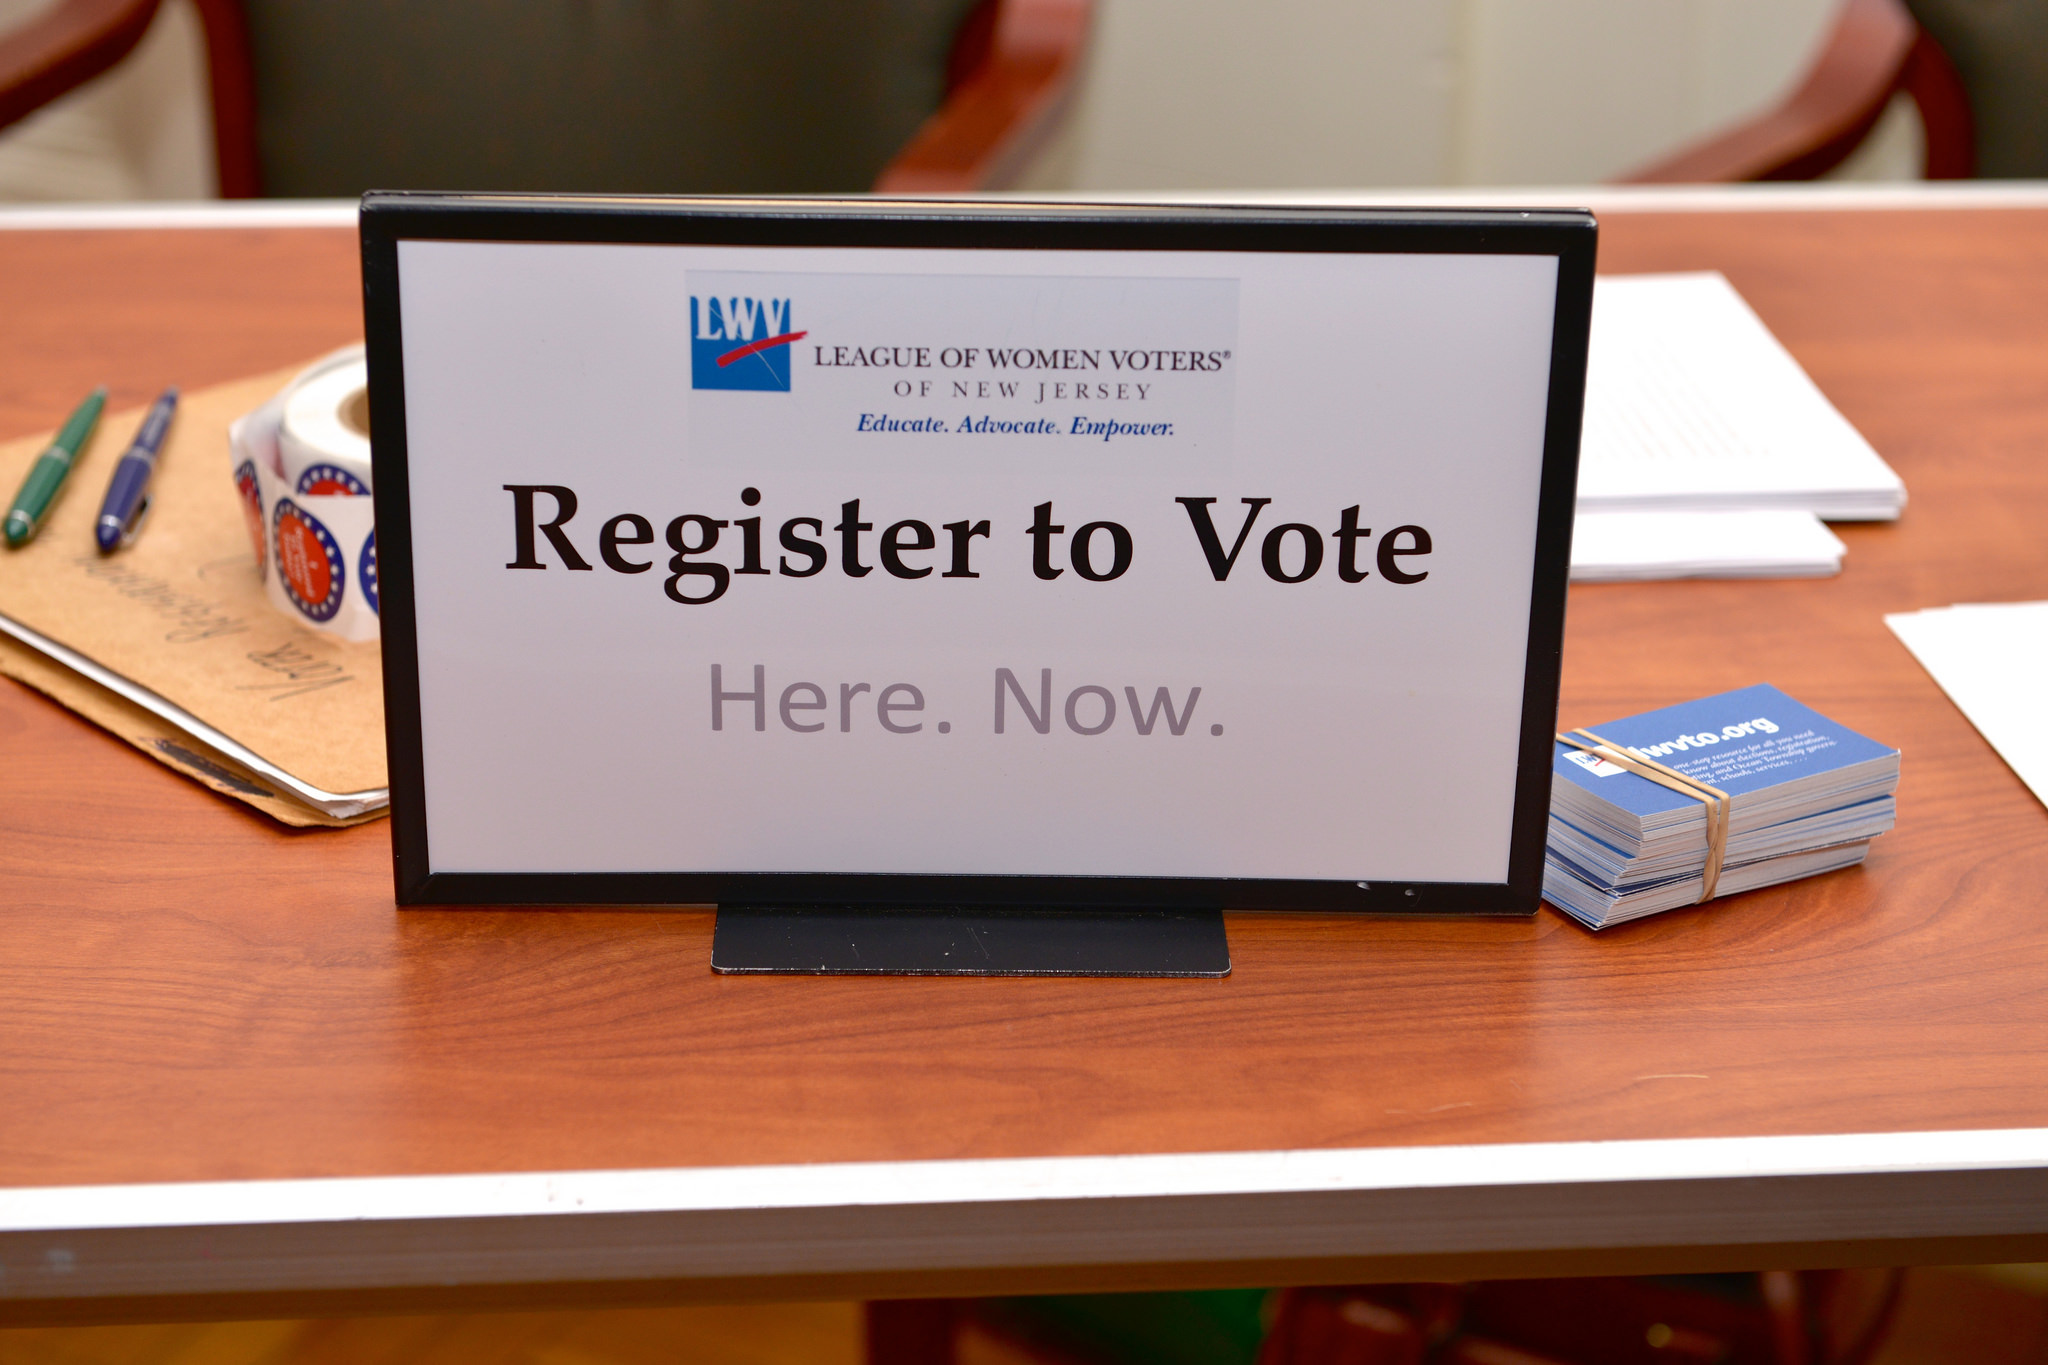 LWV NJ Register to Vote Sign.jpg